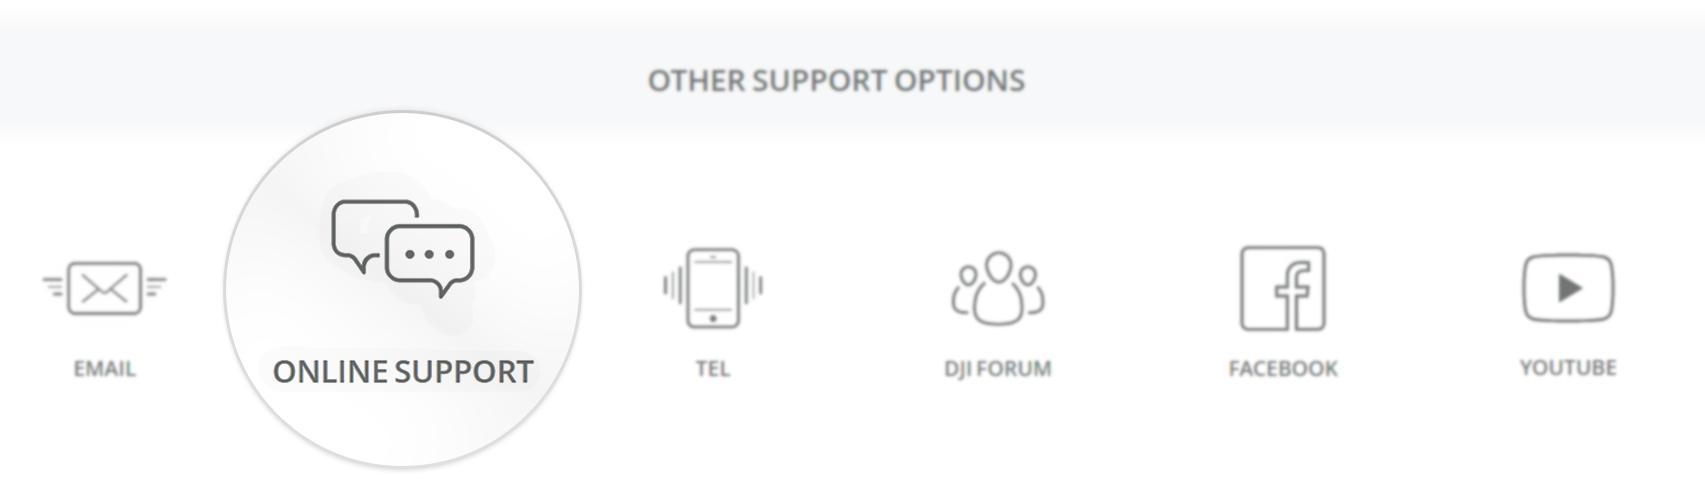 7 Ways to Contact DJI Customer Support - DJI Guides